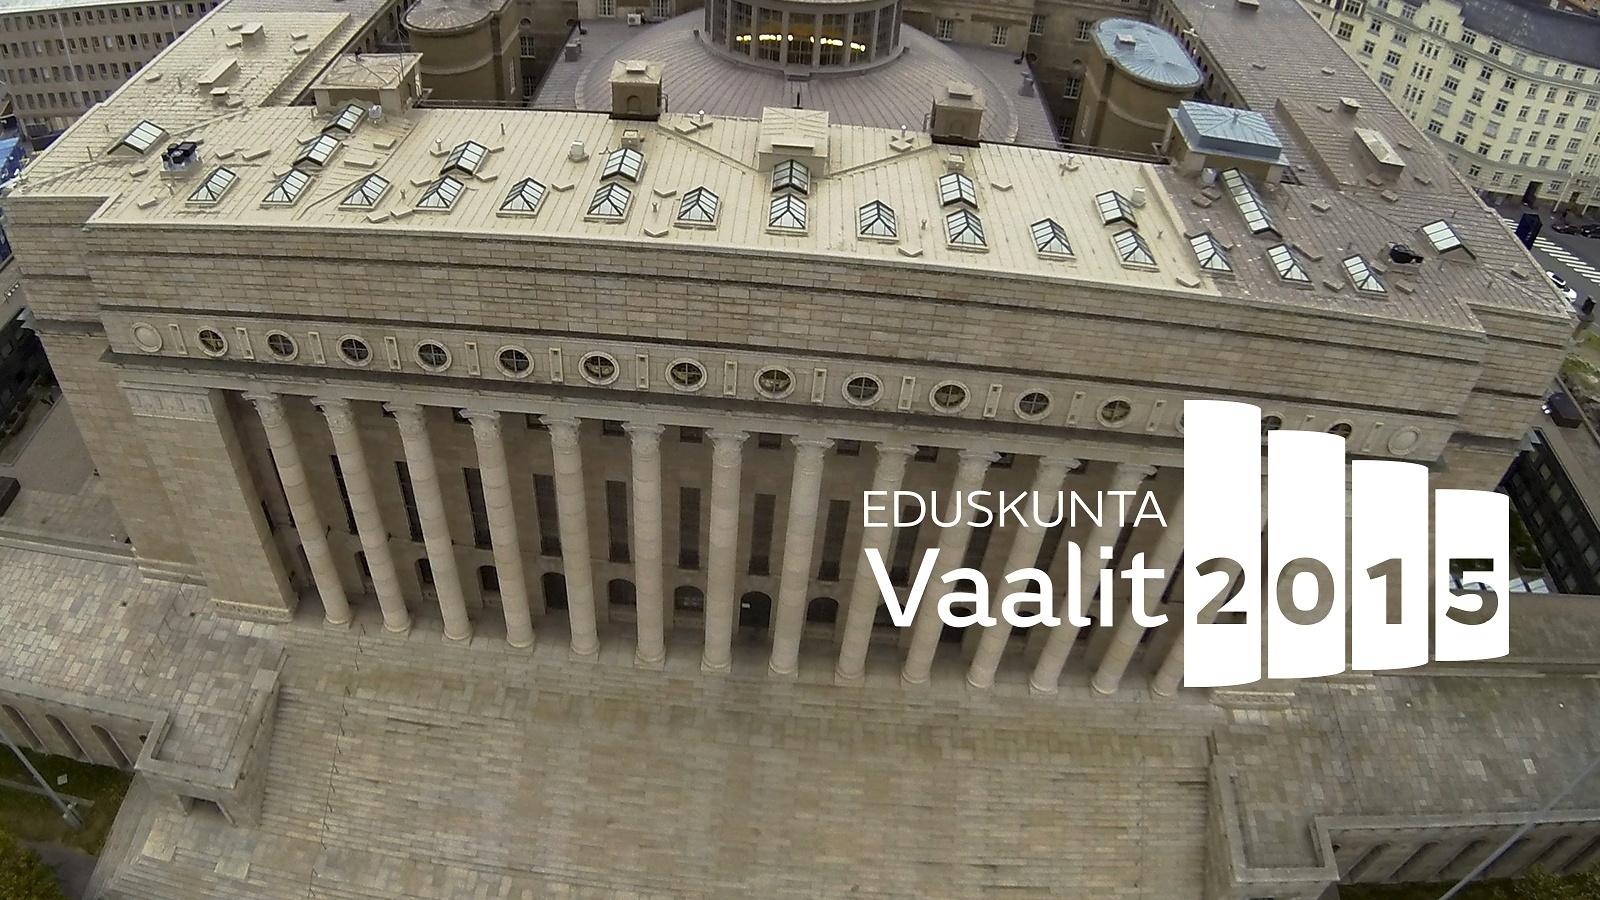 Kết quả bầu cử quốc hội Phần Lan 2015 – Eduskuntavaalien tulos 2015.